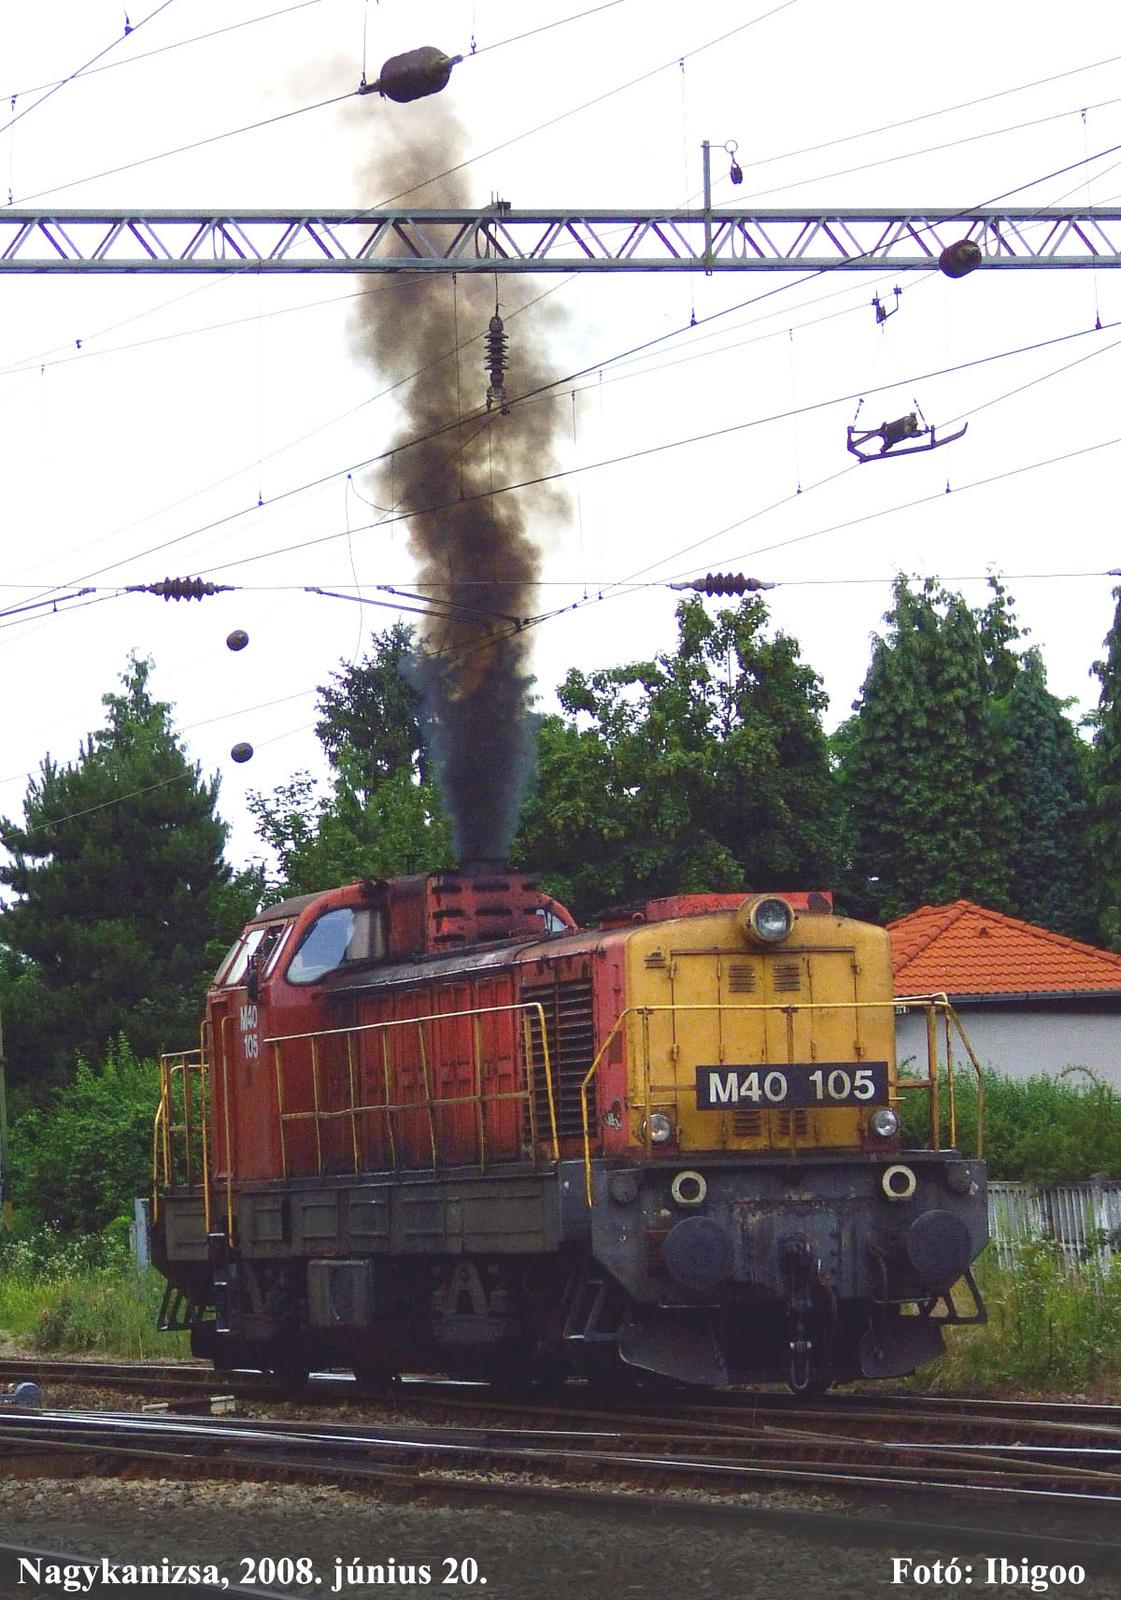 20080620.nagykanizsa.003